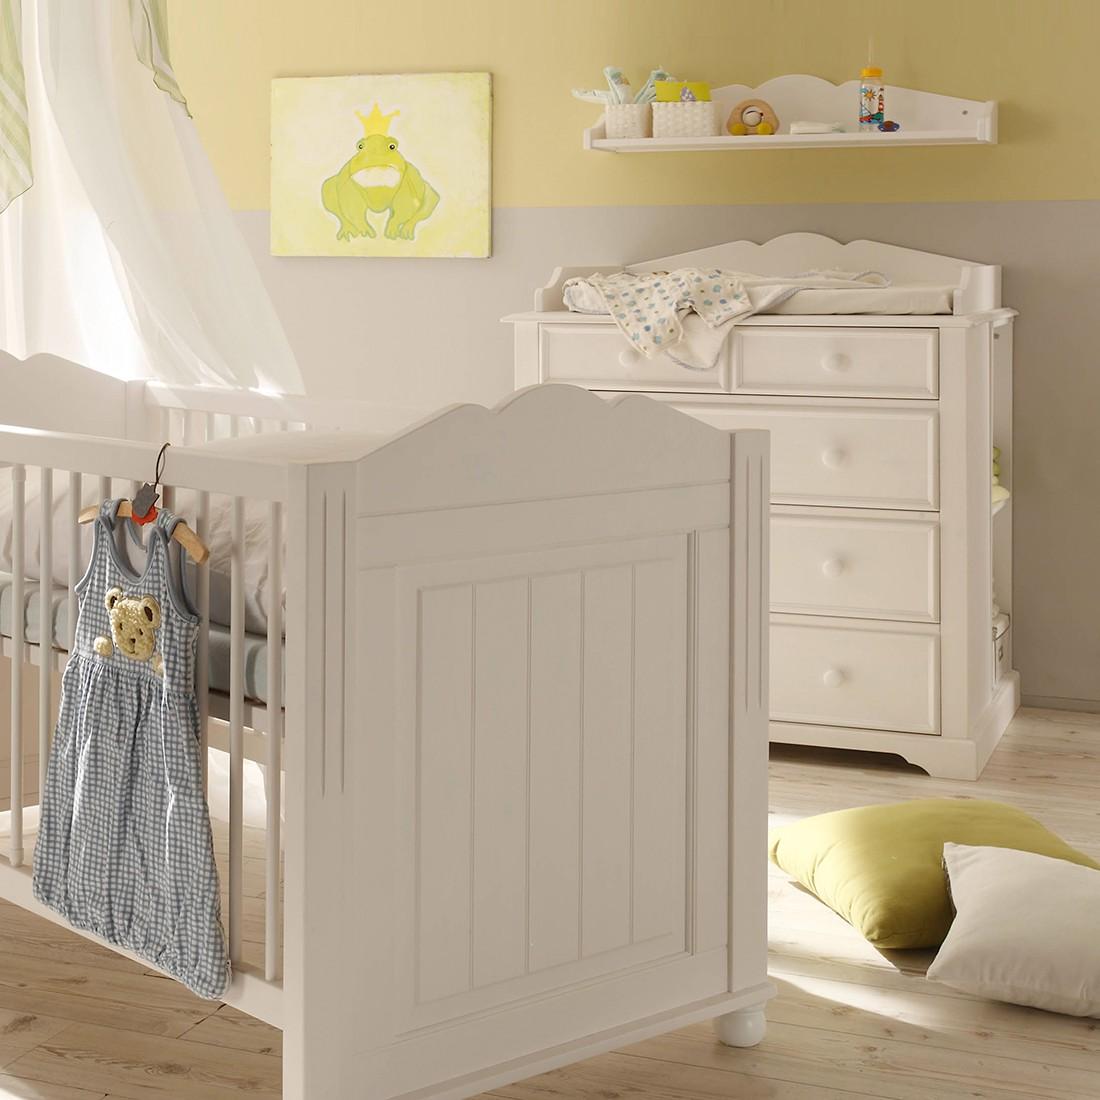 Babyzimmerset La Coquette (3-teilig) - Kiefer teilmassiv - Weiß, Jack and Alice